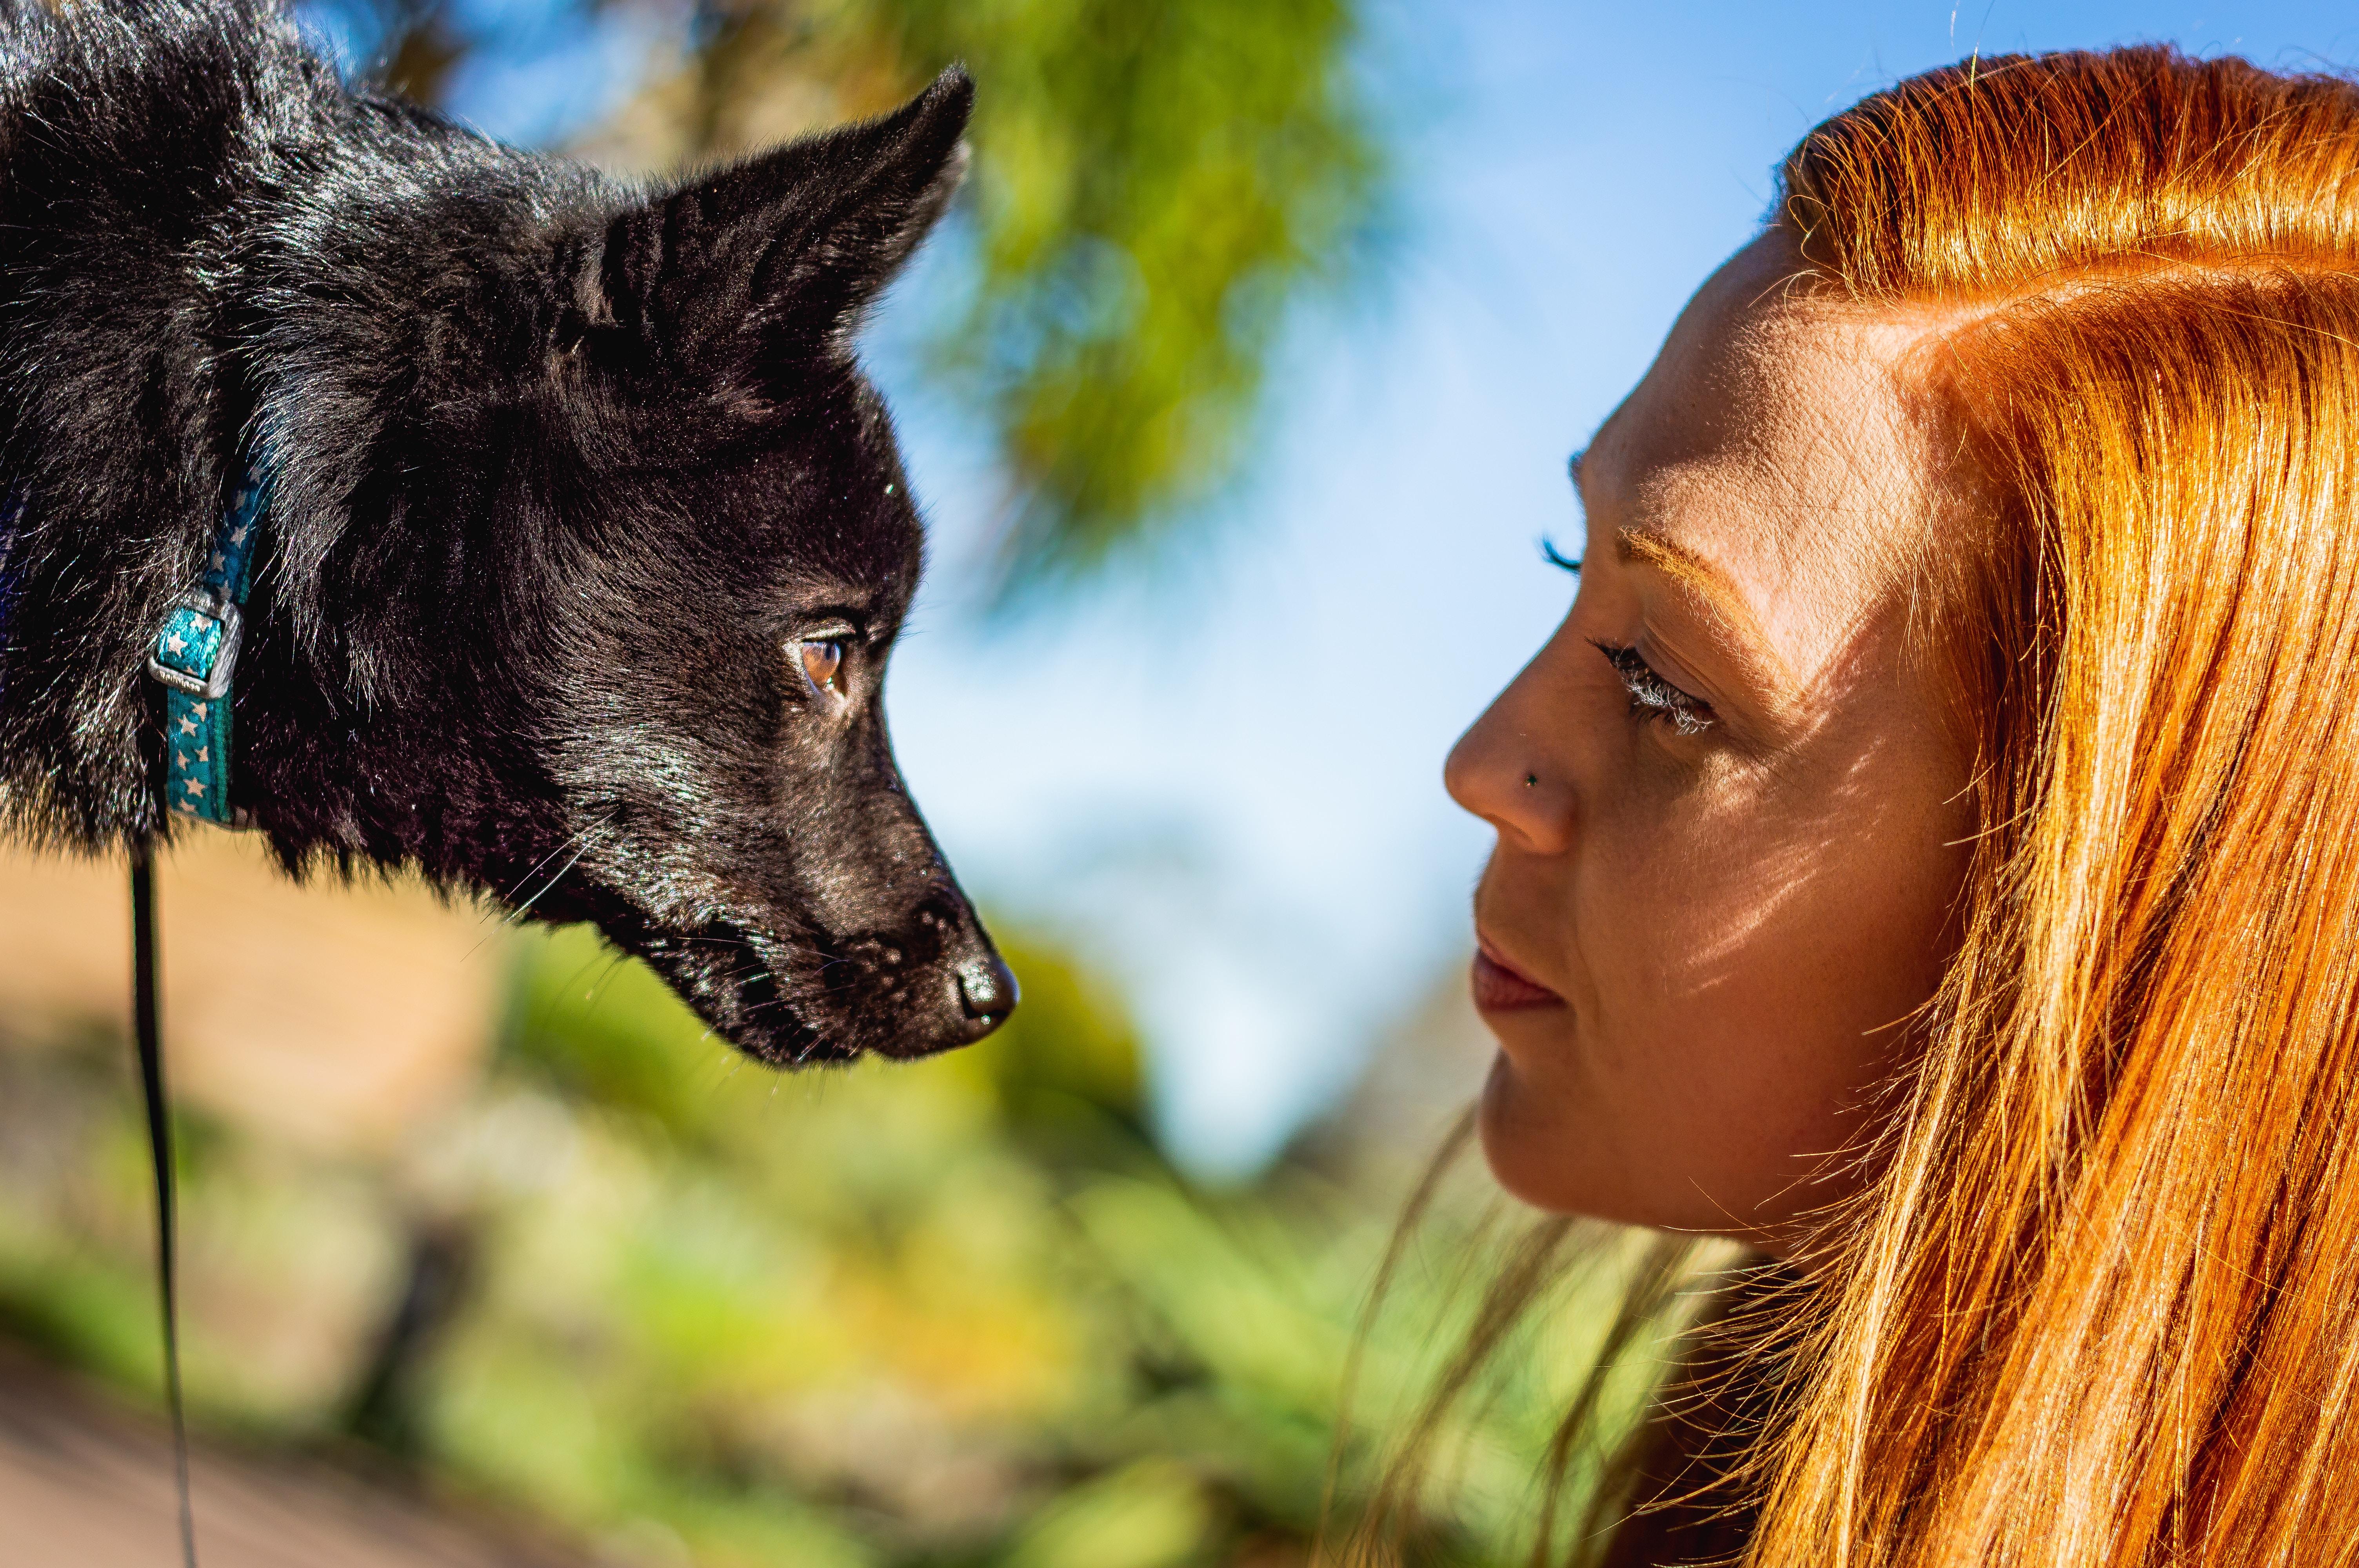 woman looking at short-coated dog